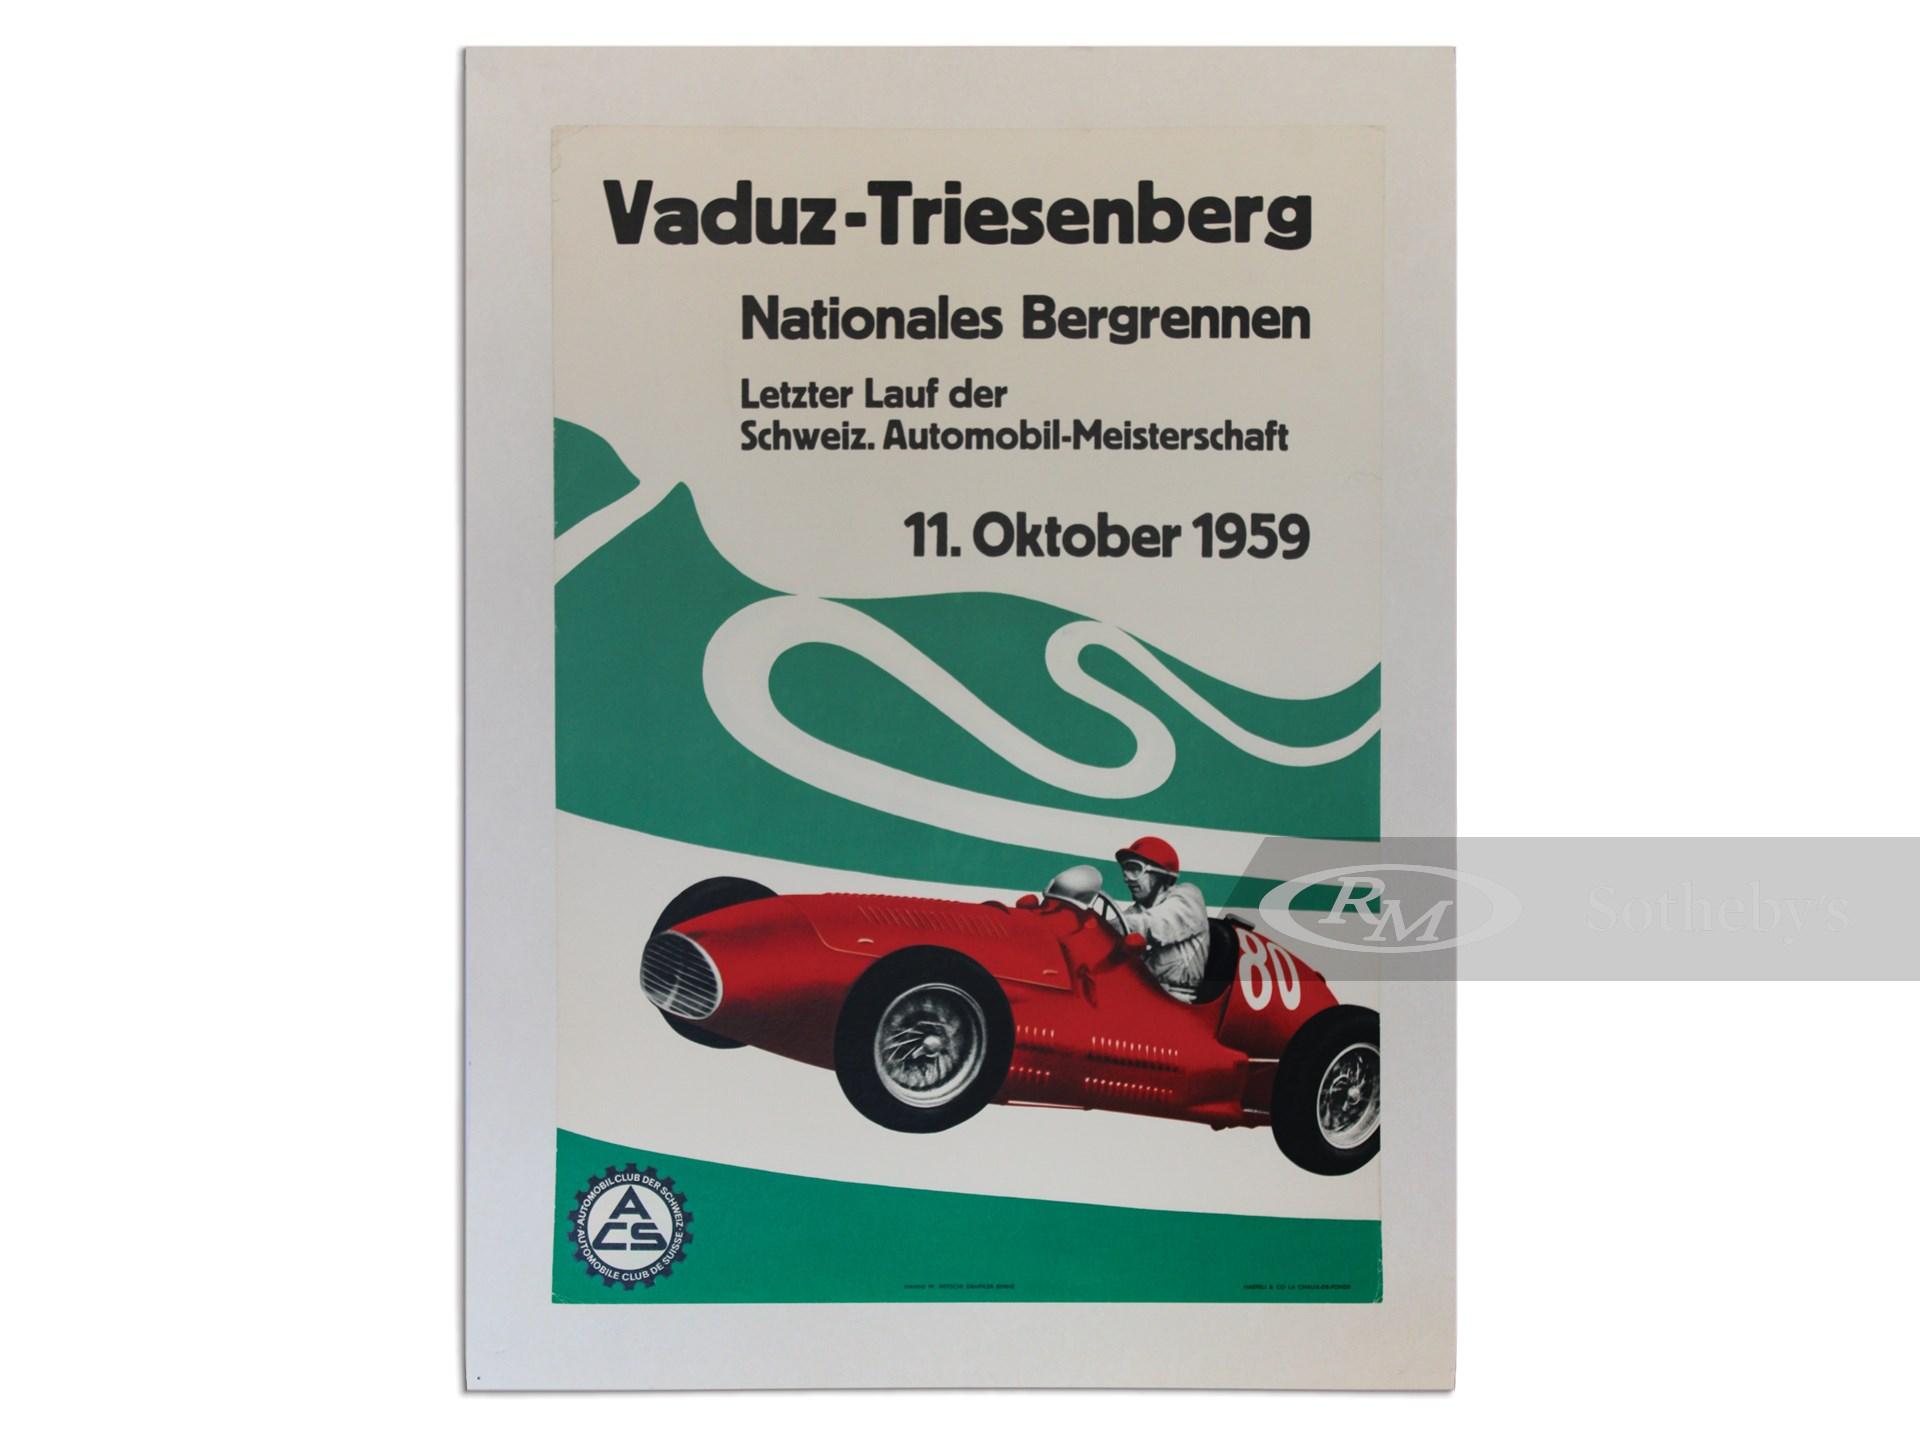 """Vaduz-Triesenberg, Nationales Bergrennen"" October 11, 1959 Event Poster -"